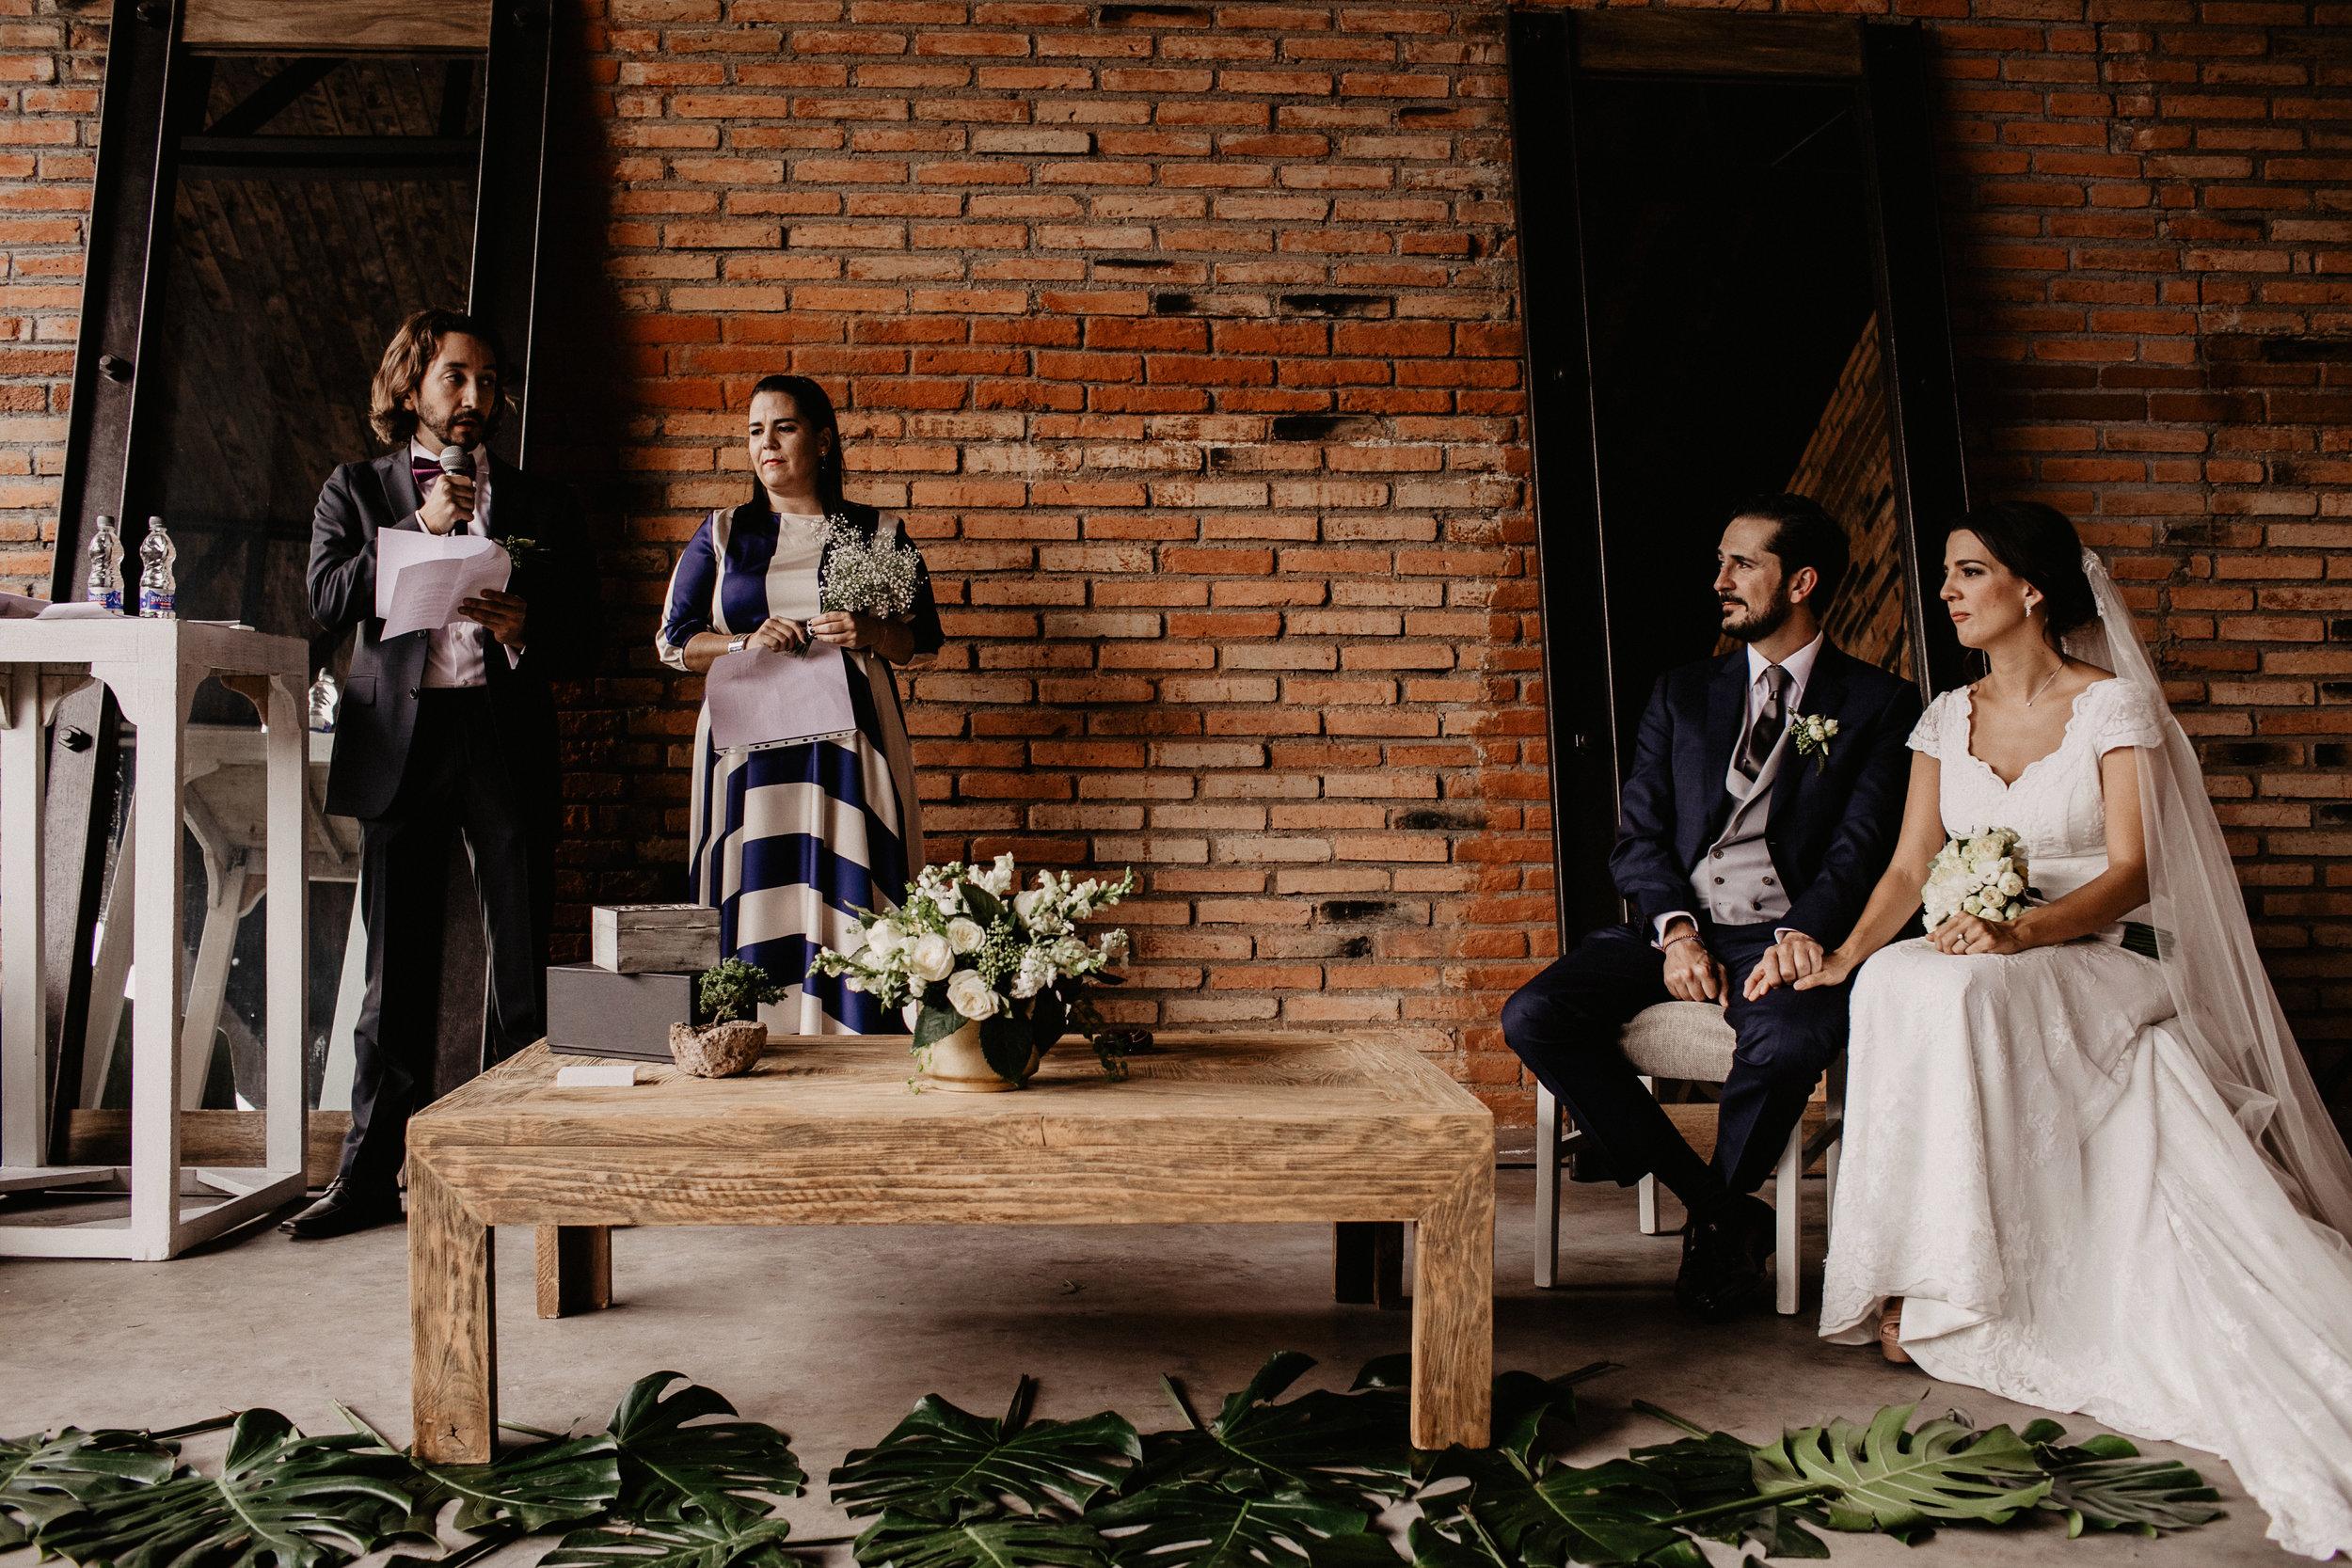 alfonso_flores_destination_wedding_photographer_pau_alonso_456.JPG